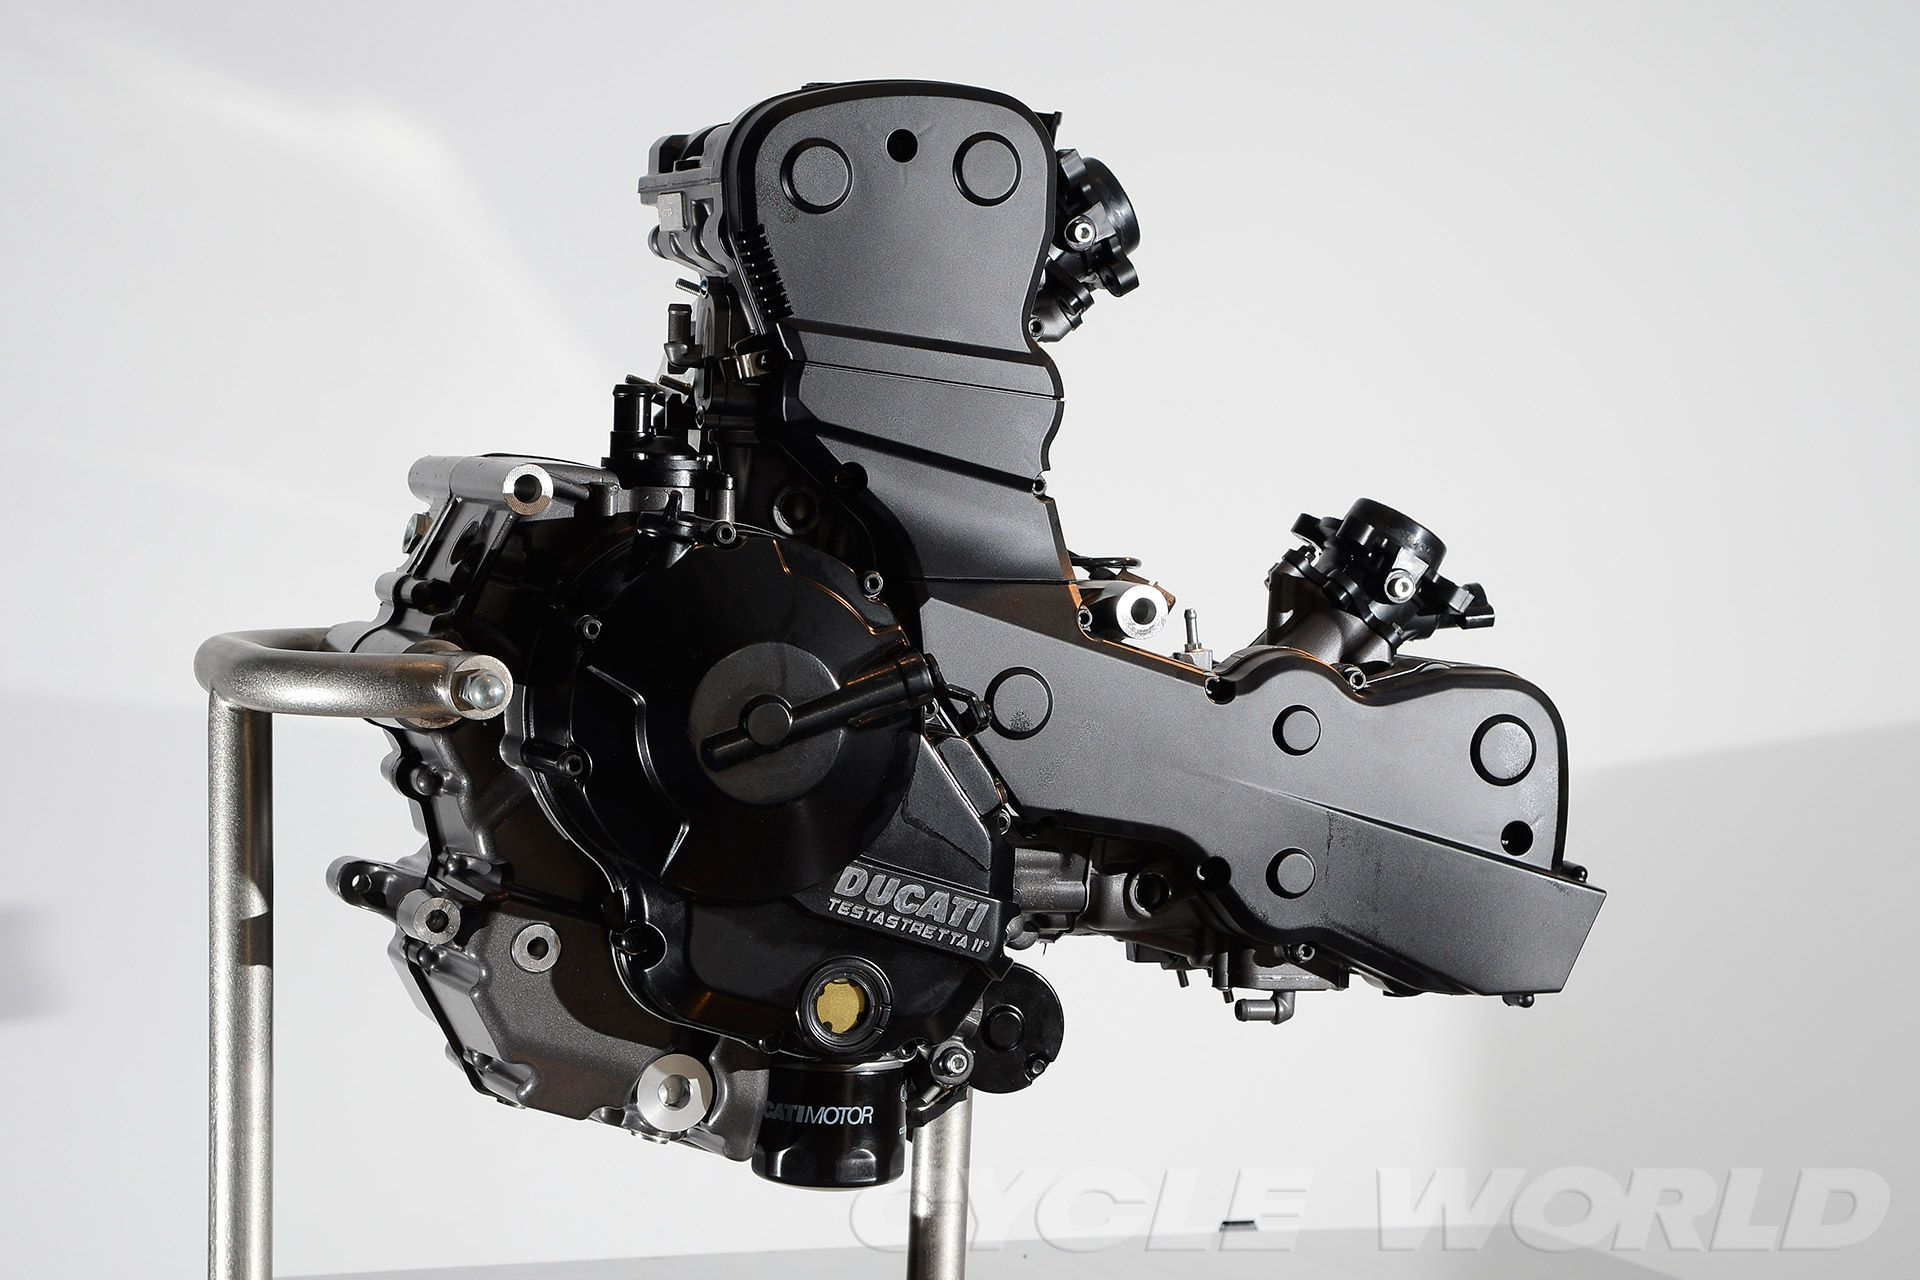 2013 Ducati Hypermotard SP - engine